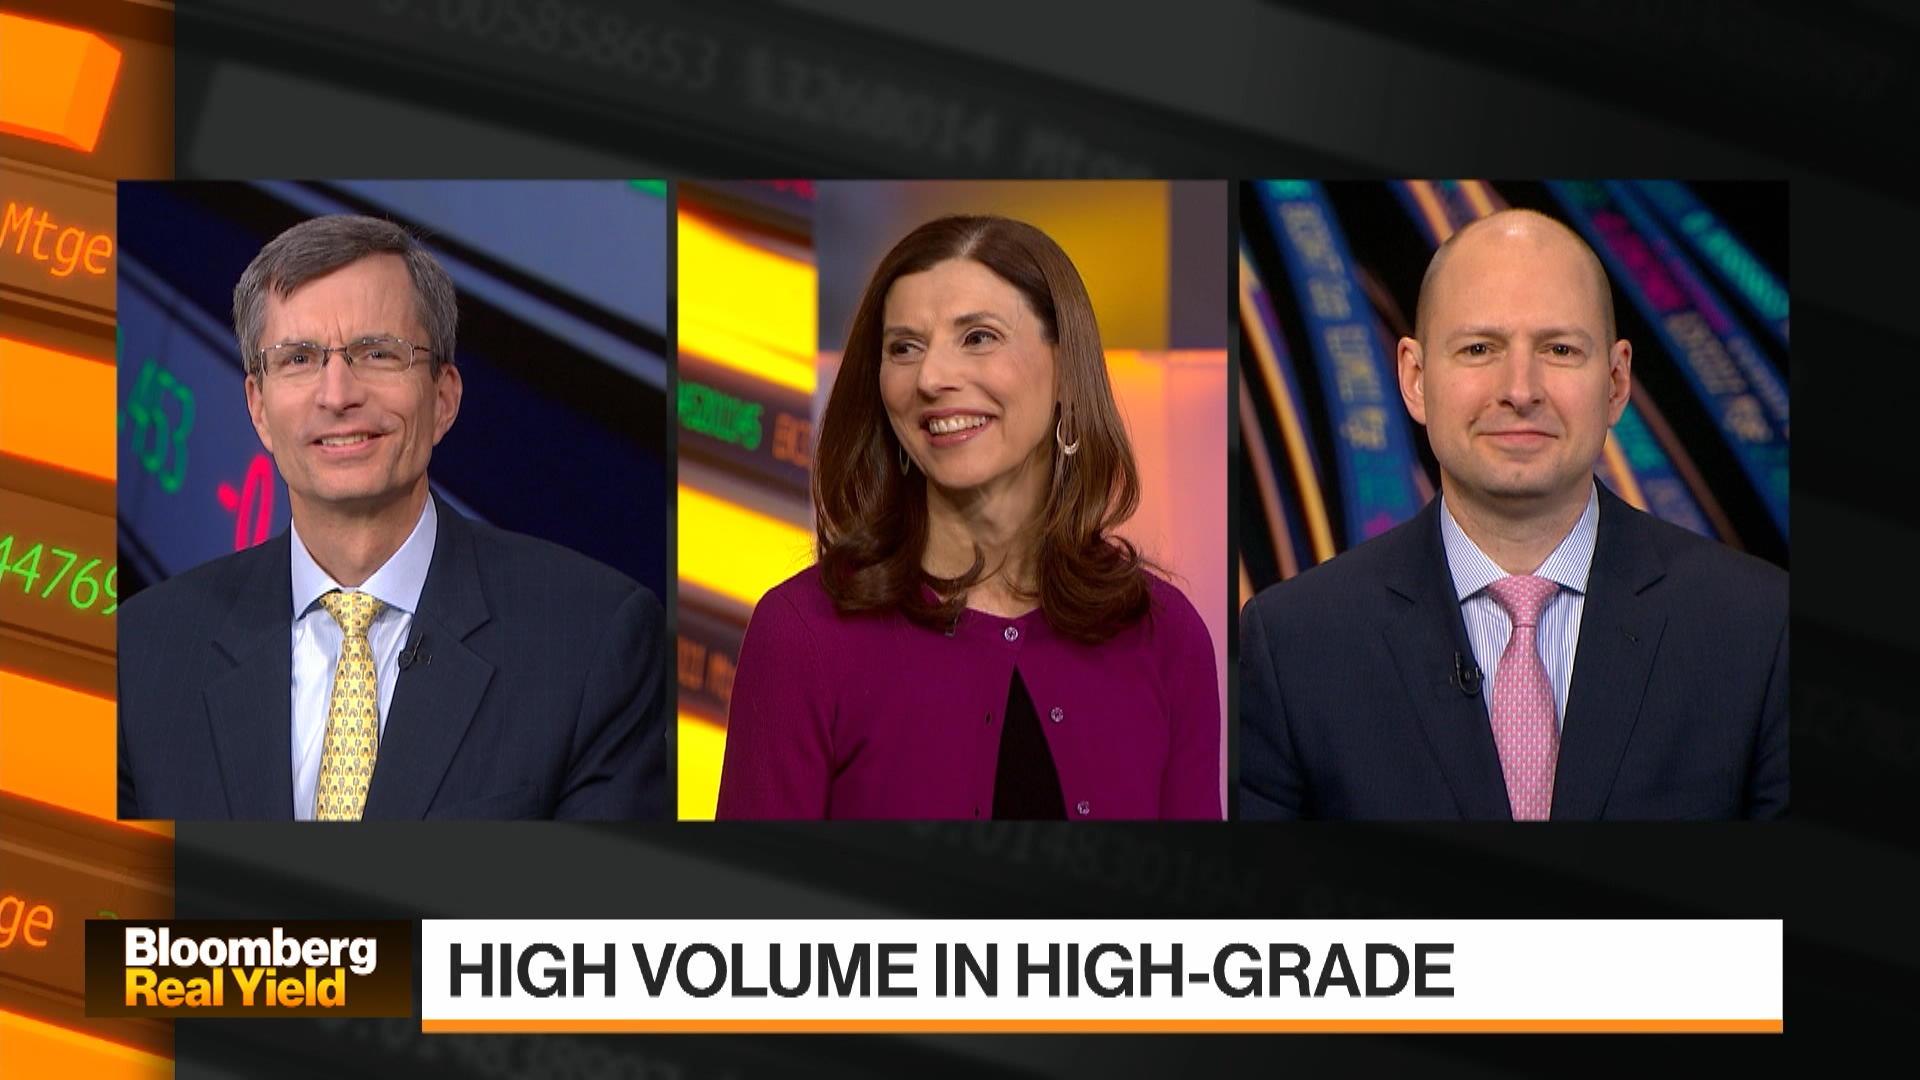 High Volume in High-Grade